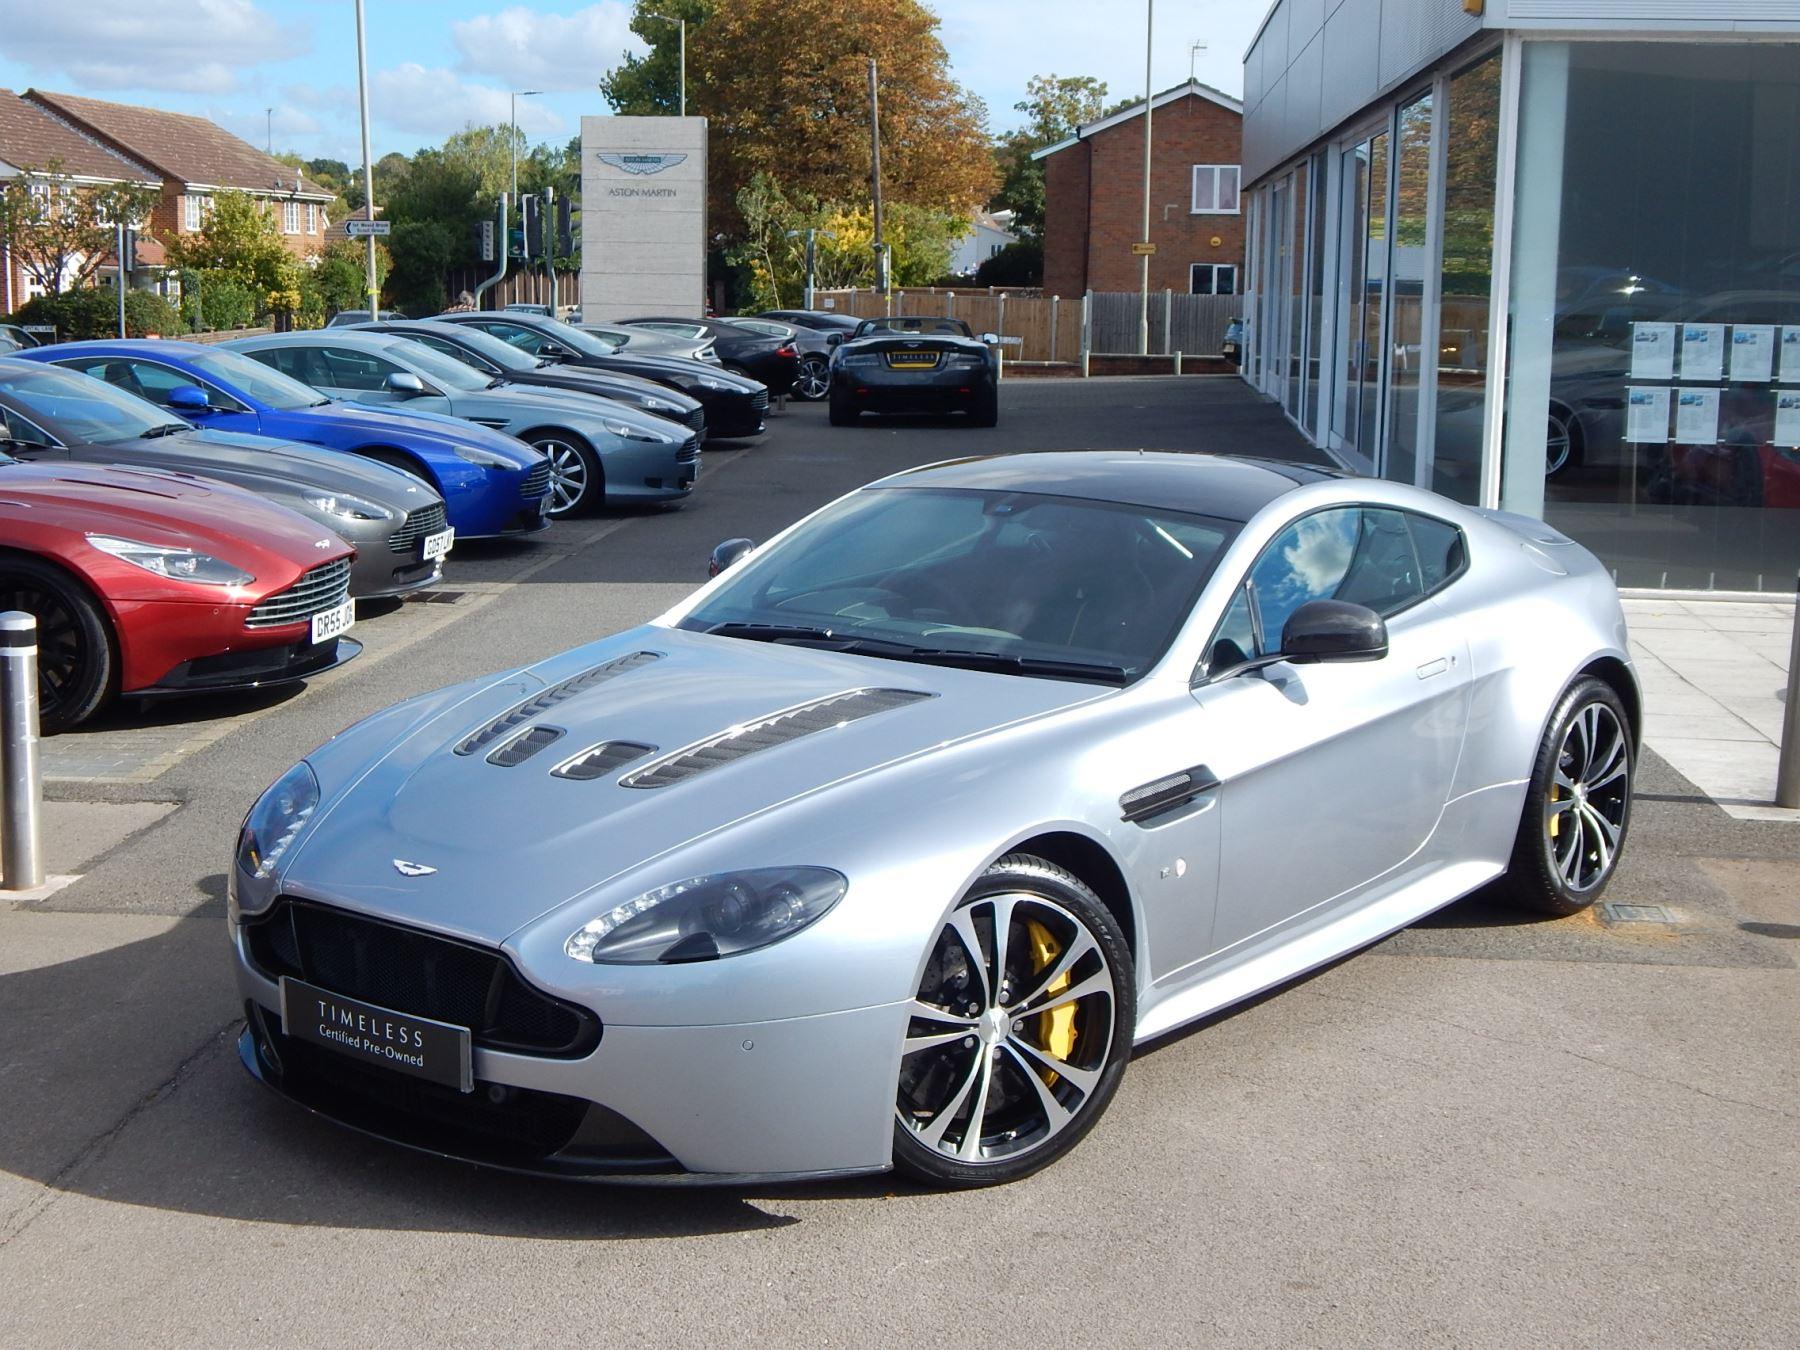 Aston Martin V Vantage S Coupe S Dr Sportshift Sports Shift - Aston martin v12